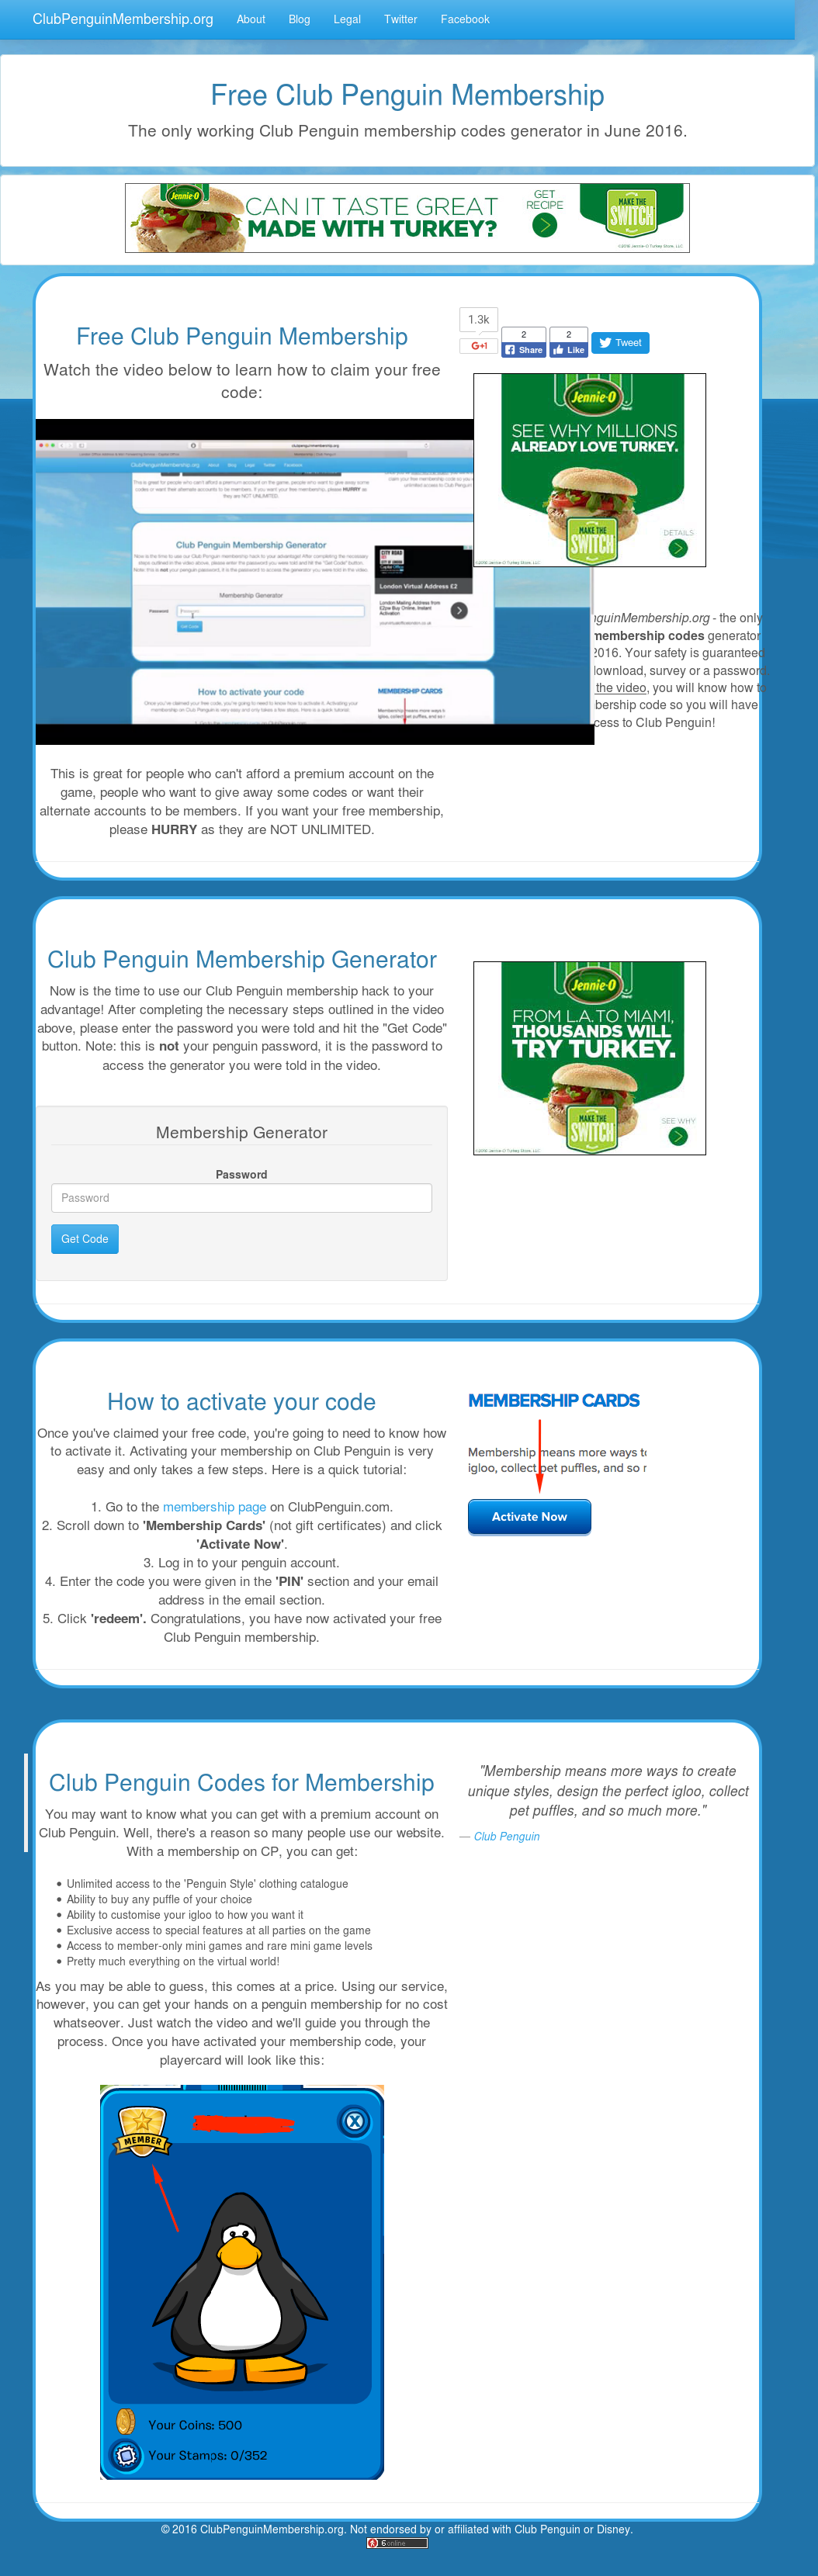 Club Penguin Mash: Club Penguin Cheats Competitors, Revenue